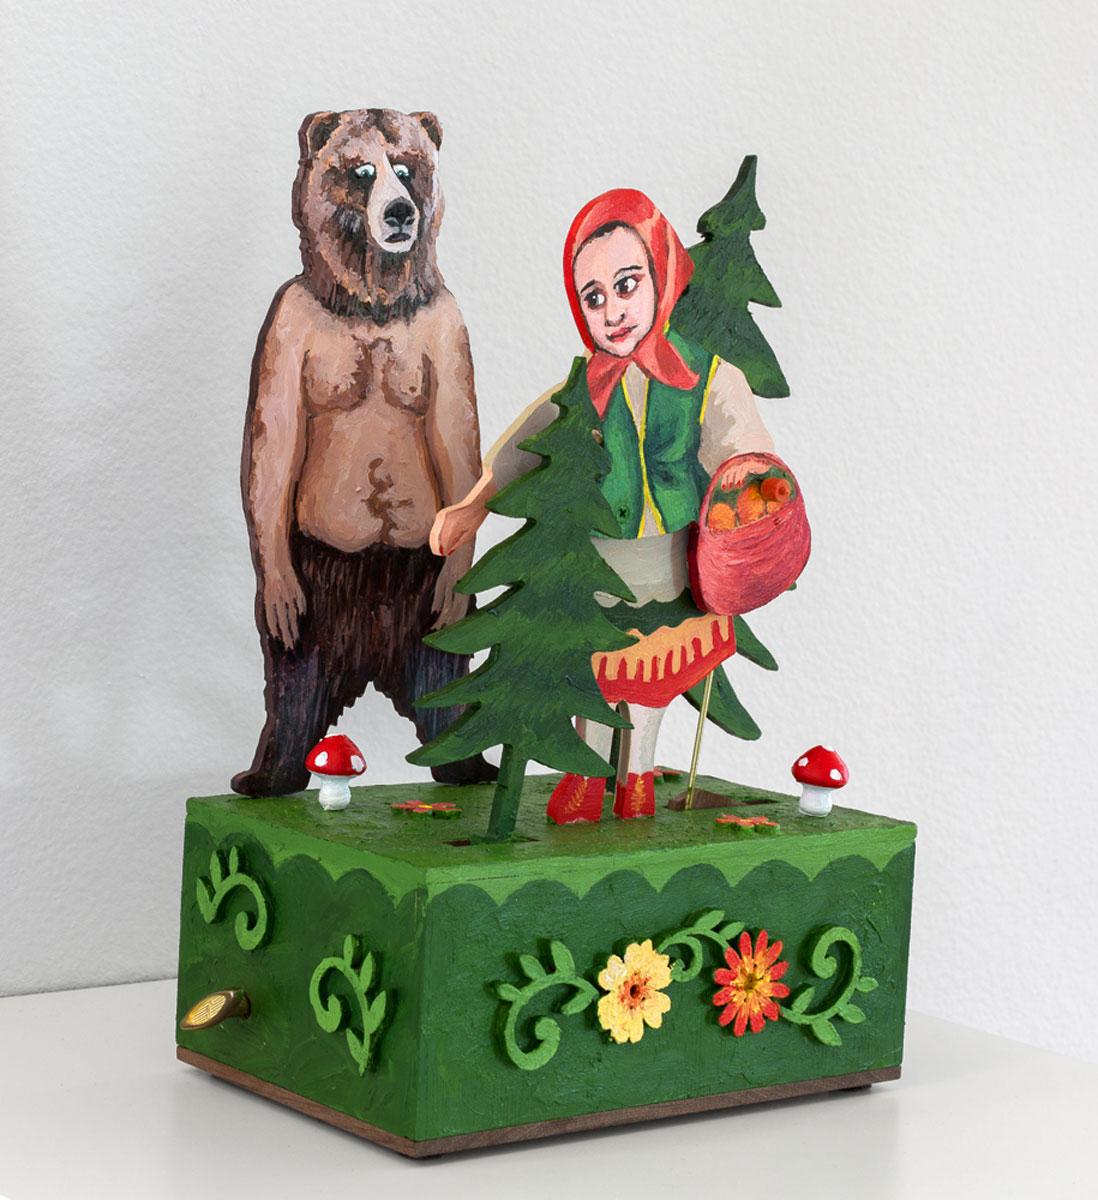 Masha and The Bear(side)